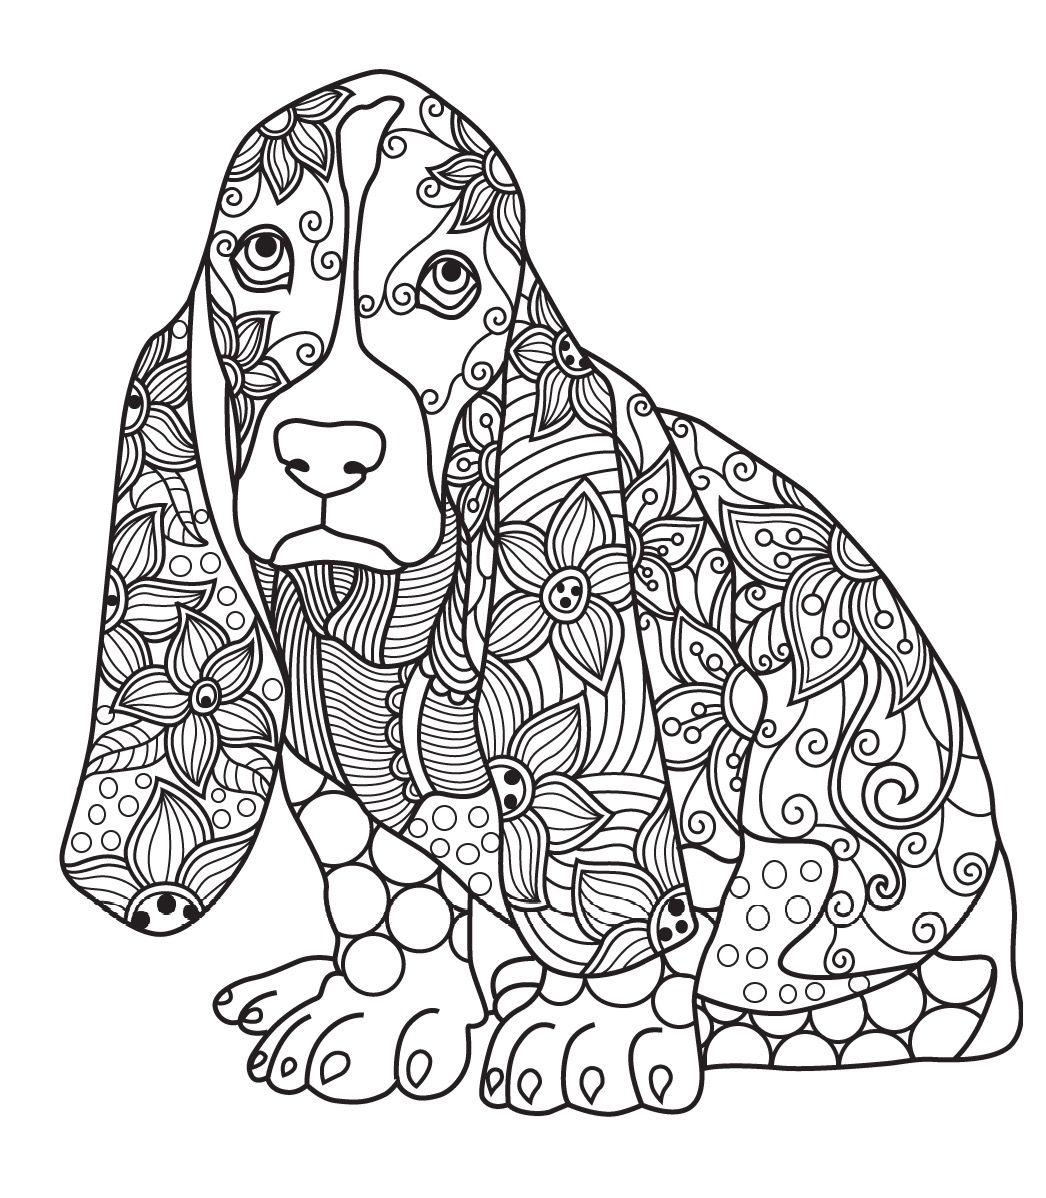 1046x1198 Dog Colorish Coloring Book For Adults Mandala Relax